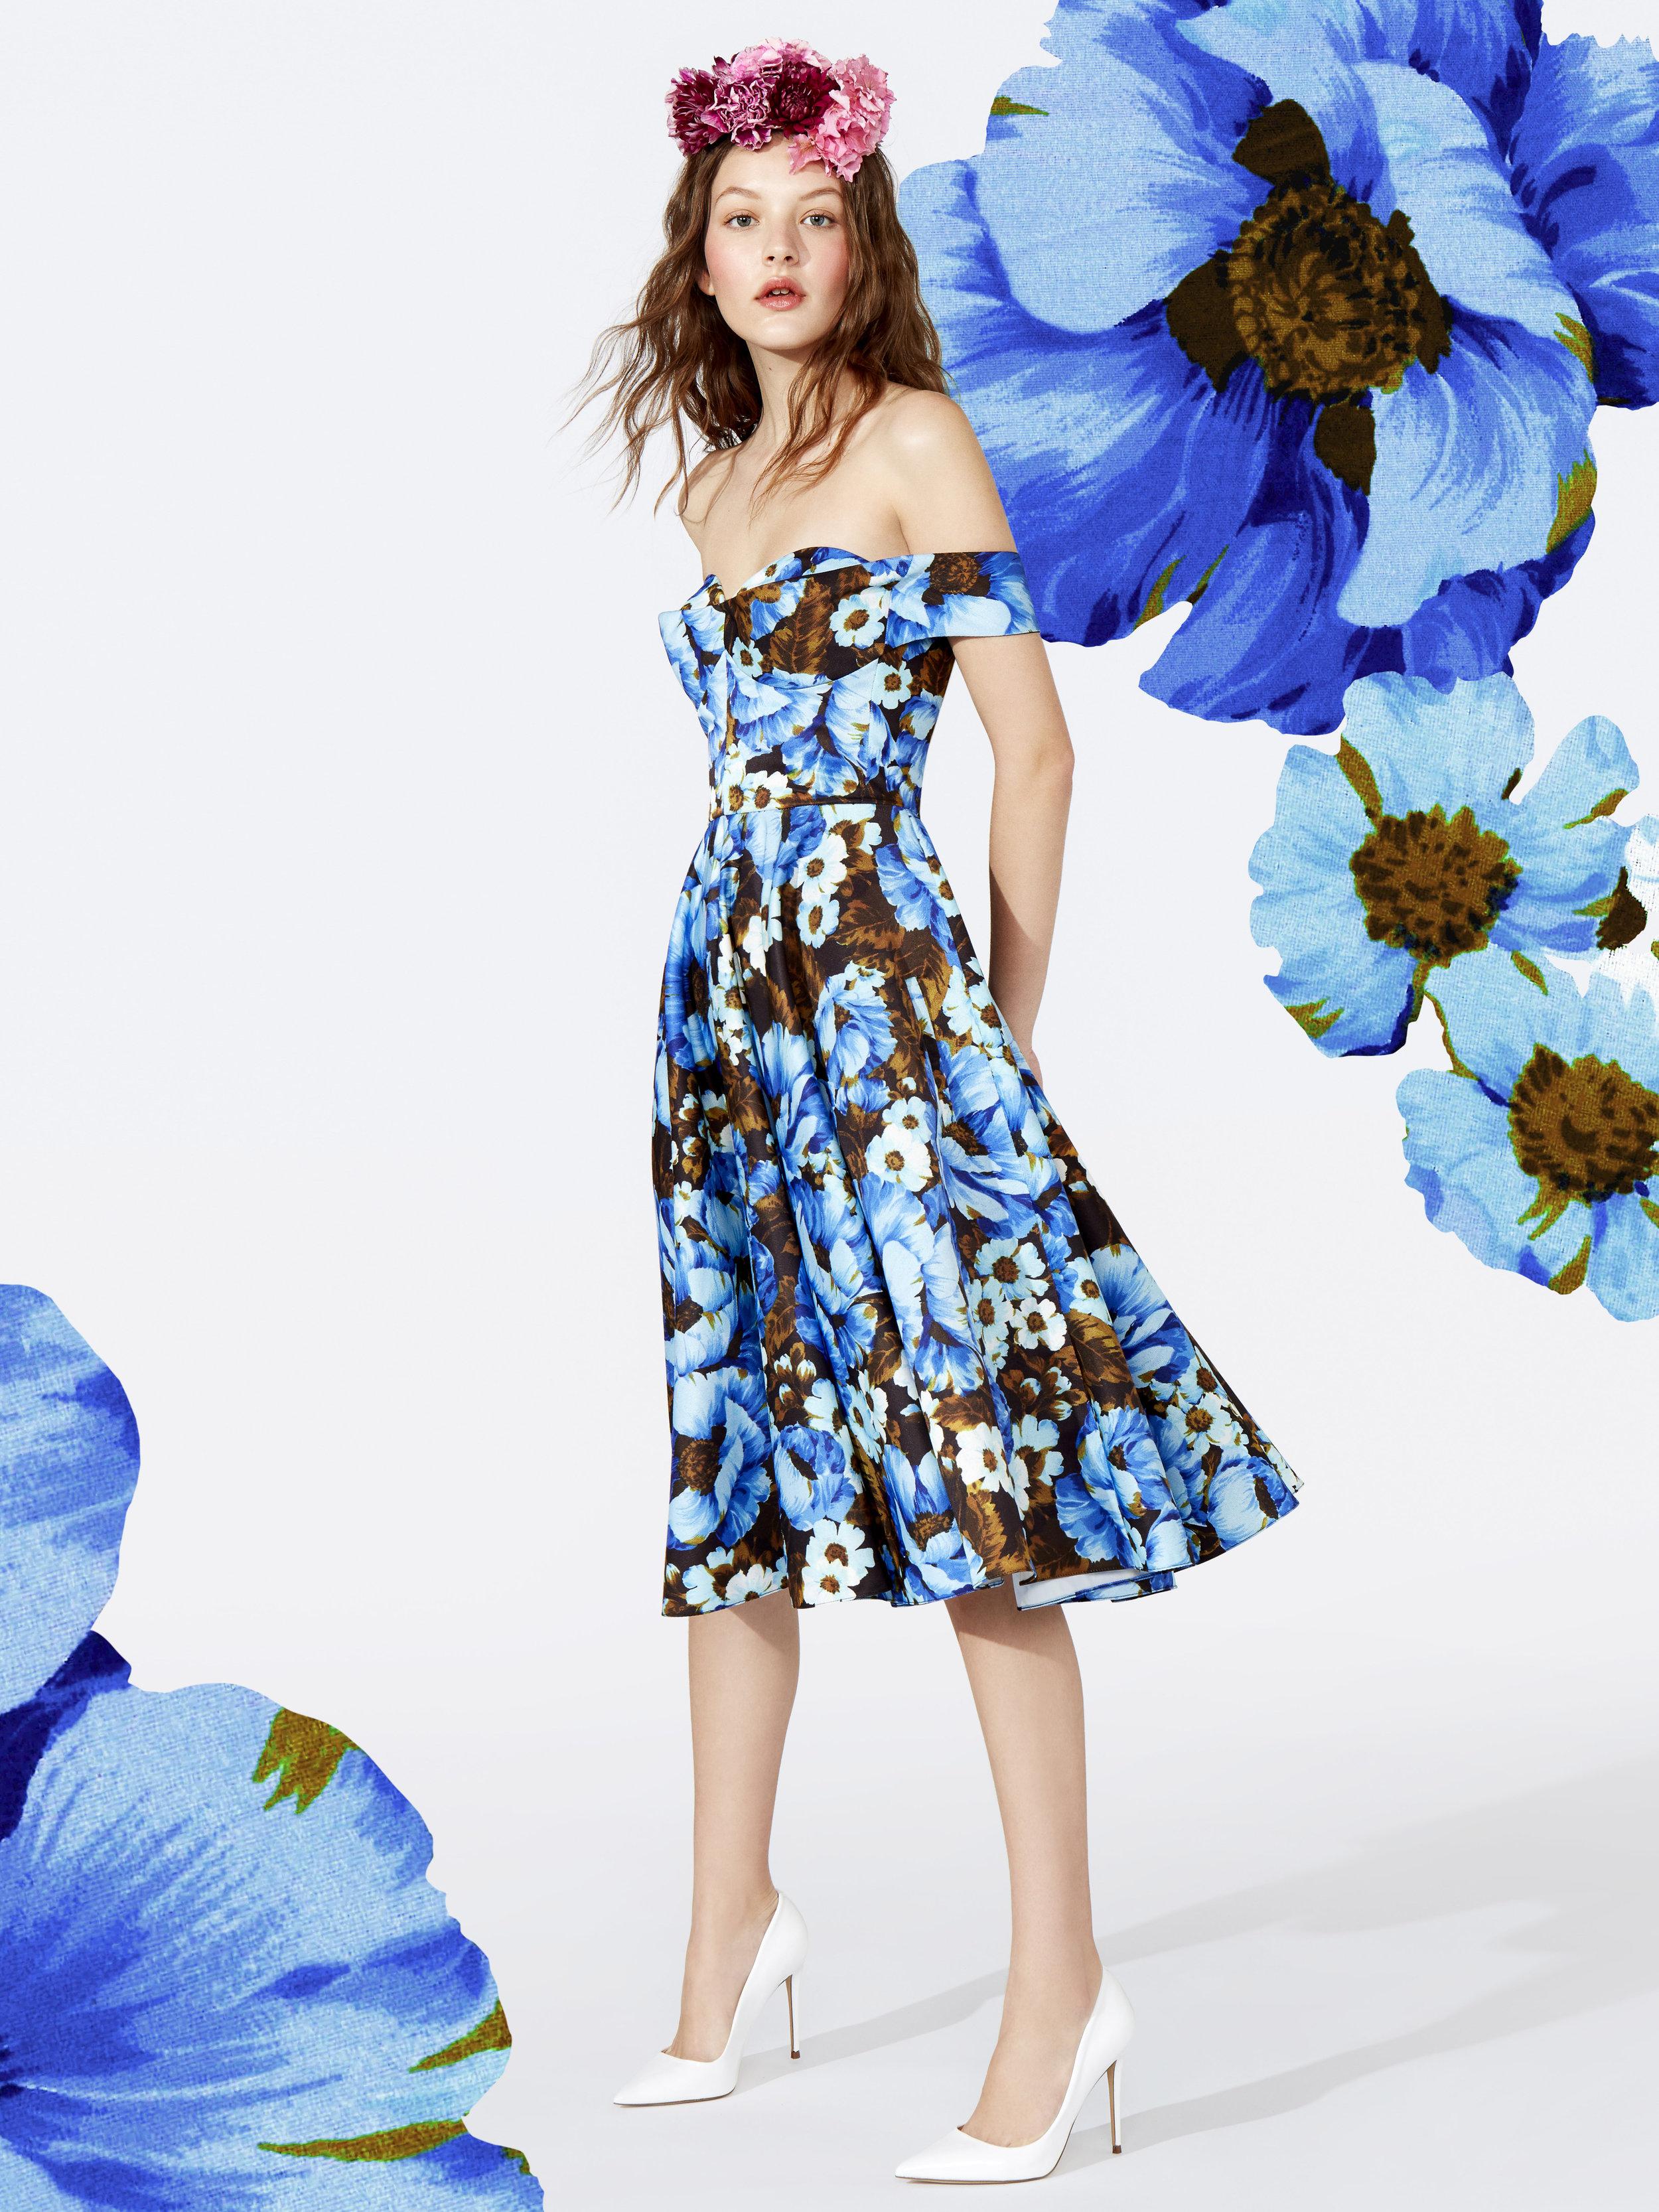 Blue Floral Dress_DEBENHAMS 2018_05_02_AL_00_RICHARD QUINN CREATIVE_NATALIA1989_V2.jpg